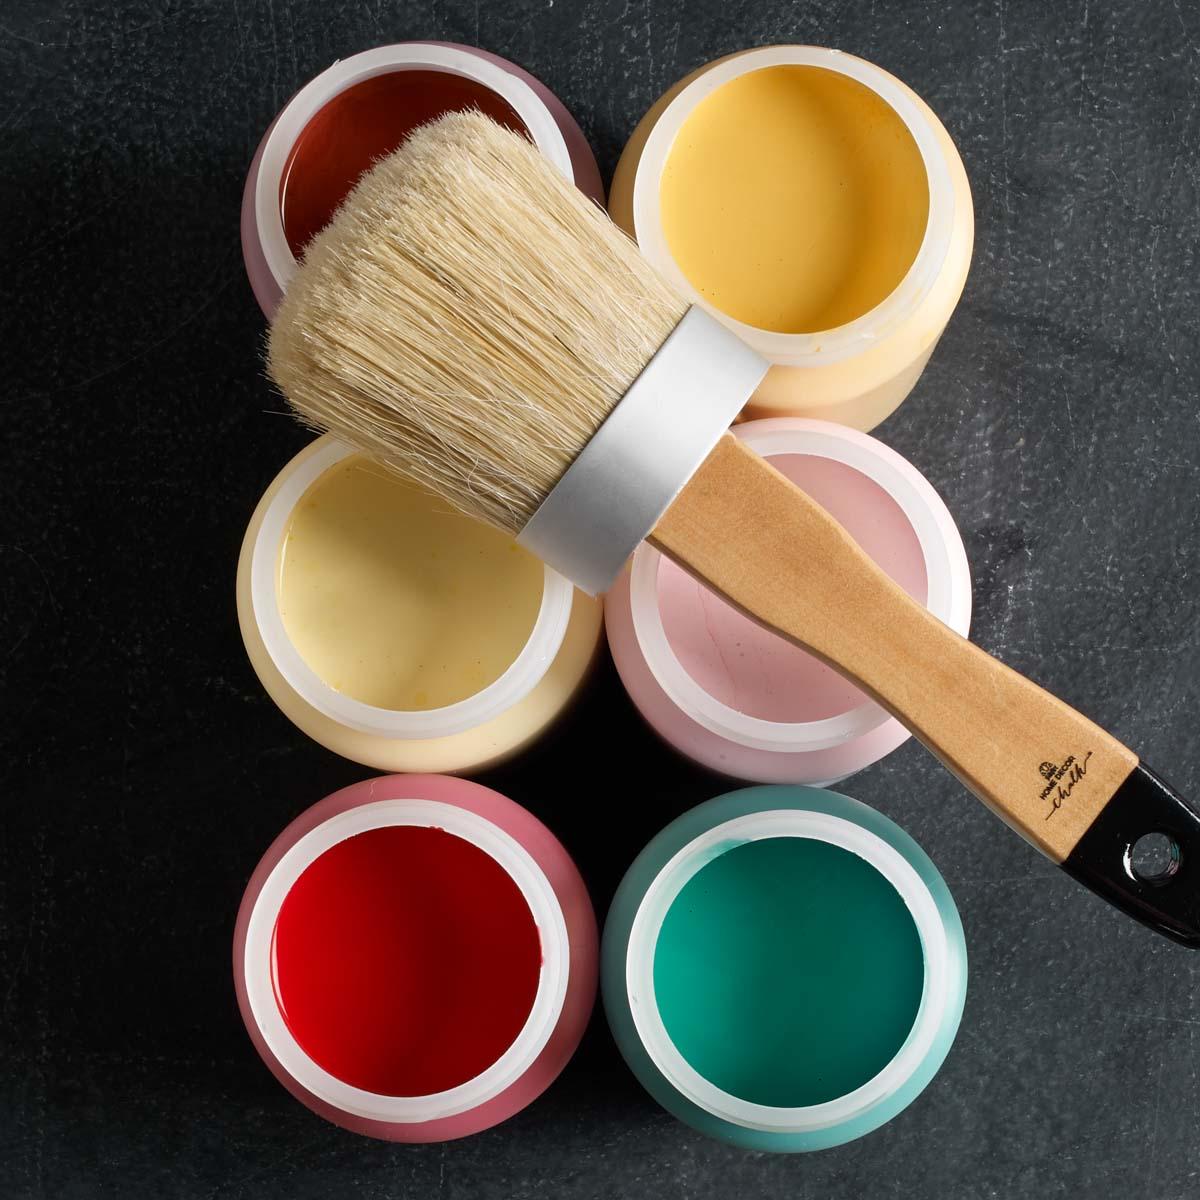 FolkArt Home Decor Chalk - Provincial Blue, 2 oz. - 6355